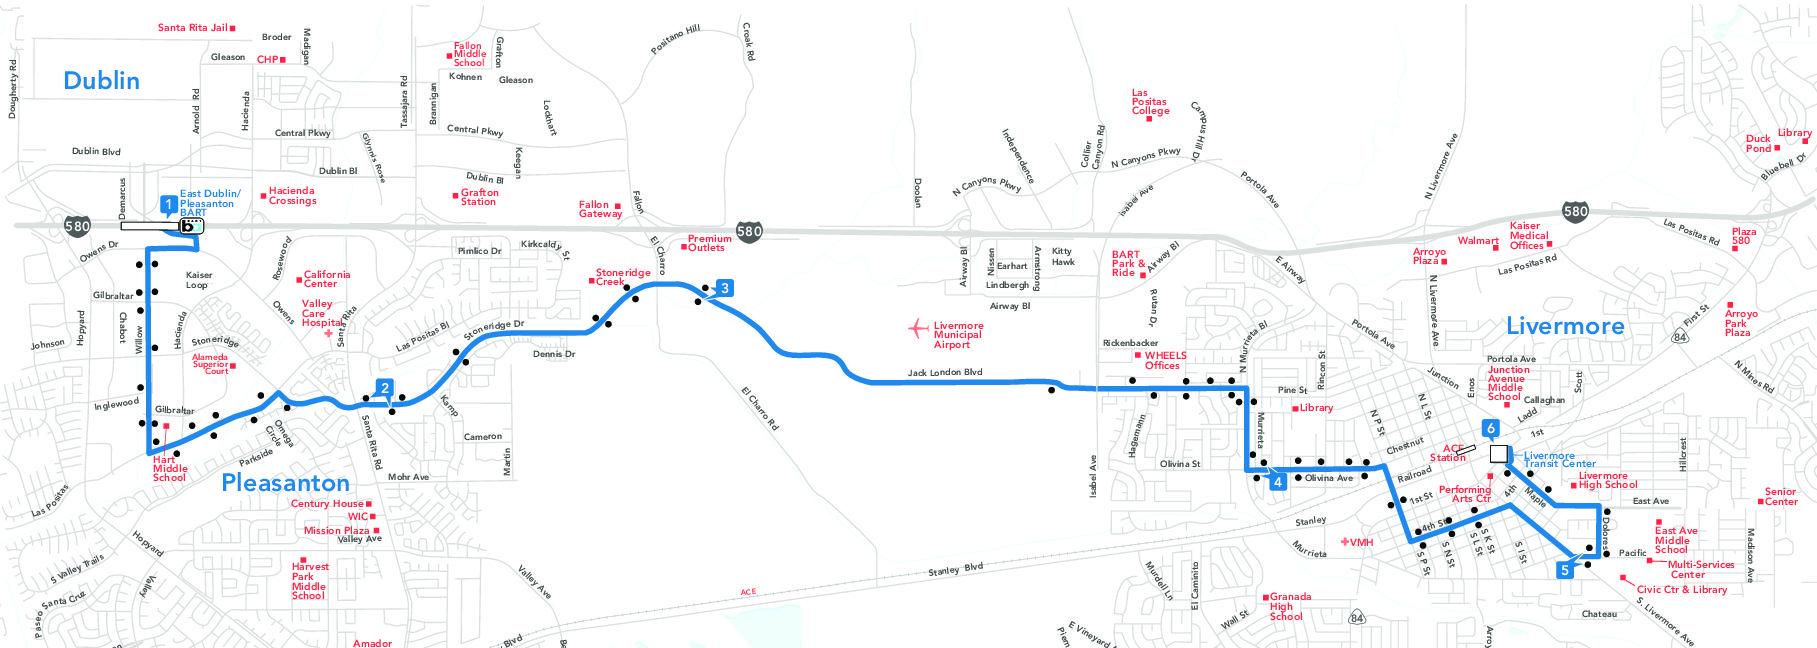 14 bus route - wheels - sf bay transit